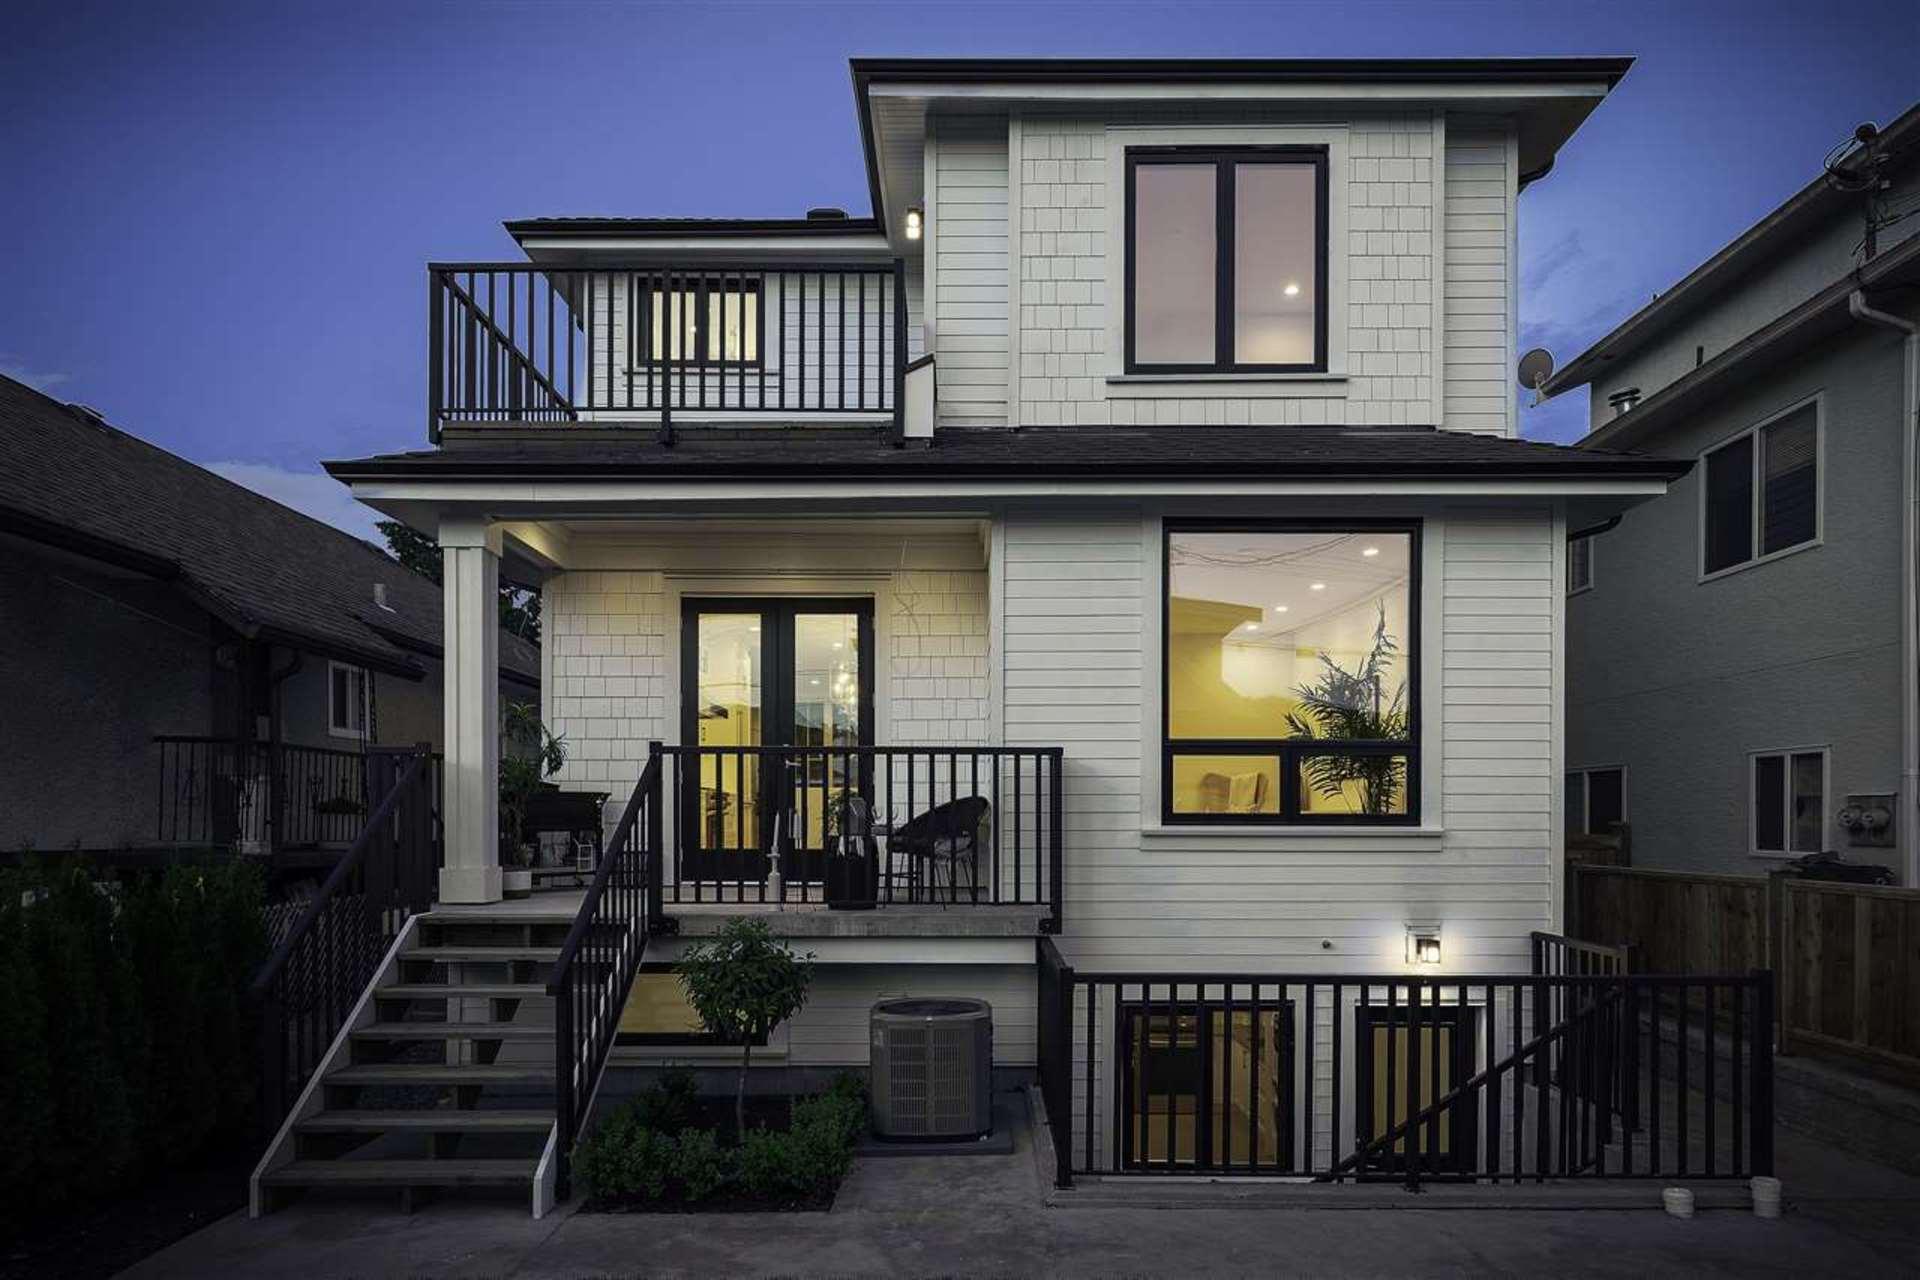 1221-rossland-street-renfrew-ve-vancouver-east-20 at 1221 Rossland Street, Renfrew VE, Vancouver East